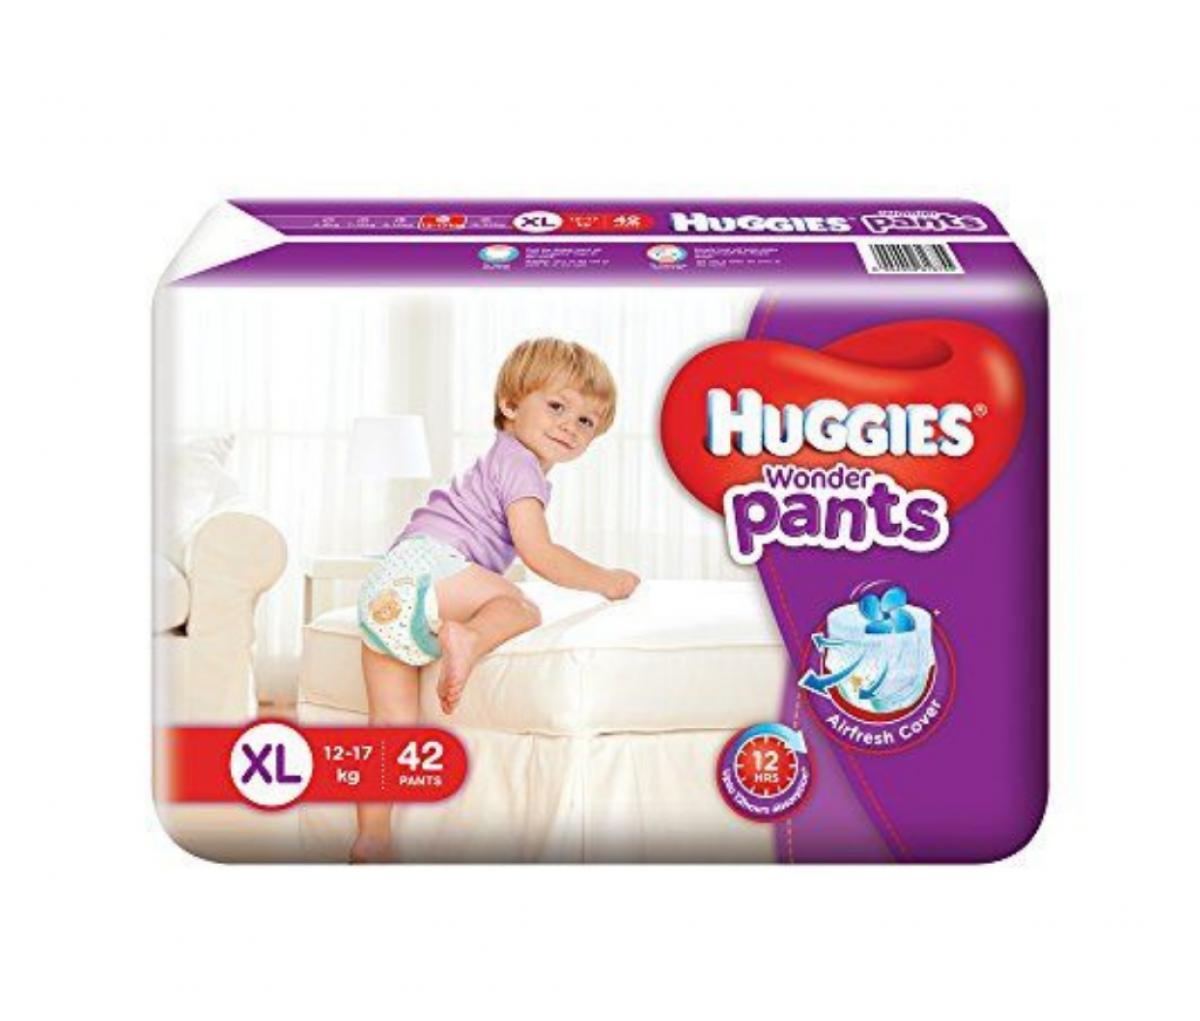 Huggies Wonder Pants X Large 42's